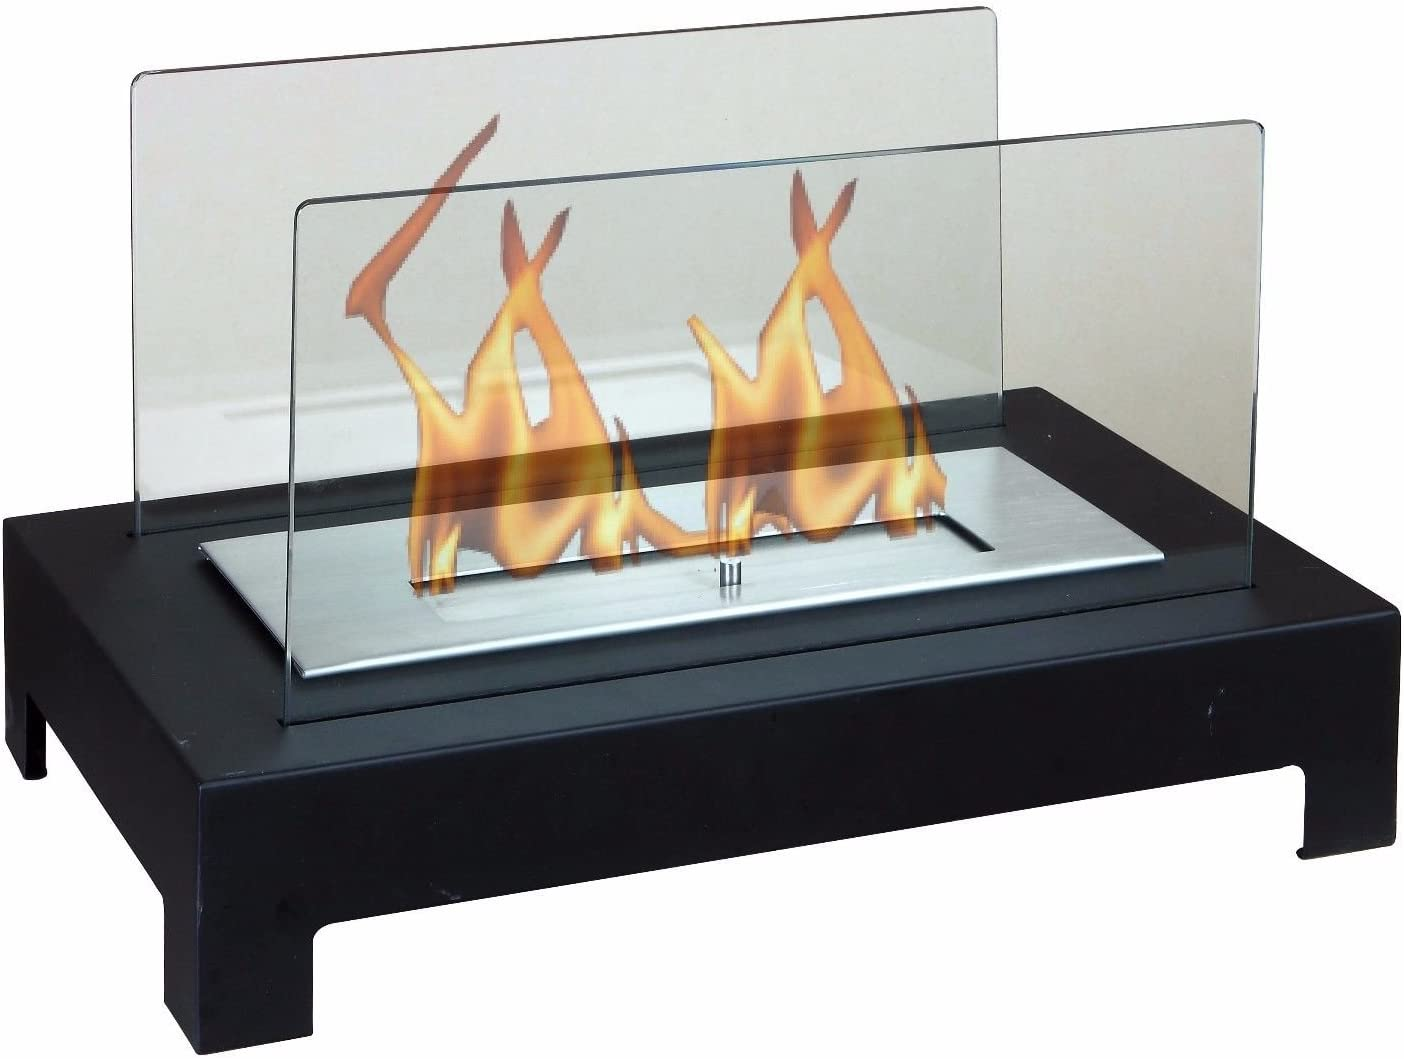 Chimenea Bioetanol diseño de mesa Apoyo Muebles Moderno Estufa ...